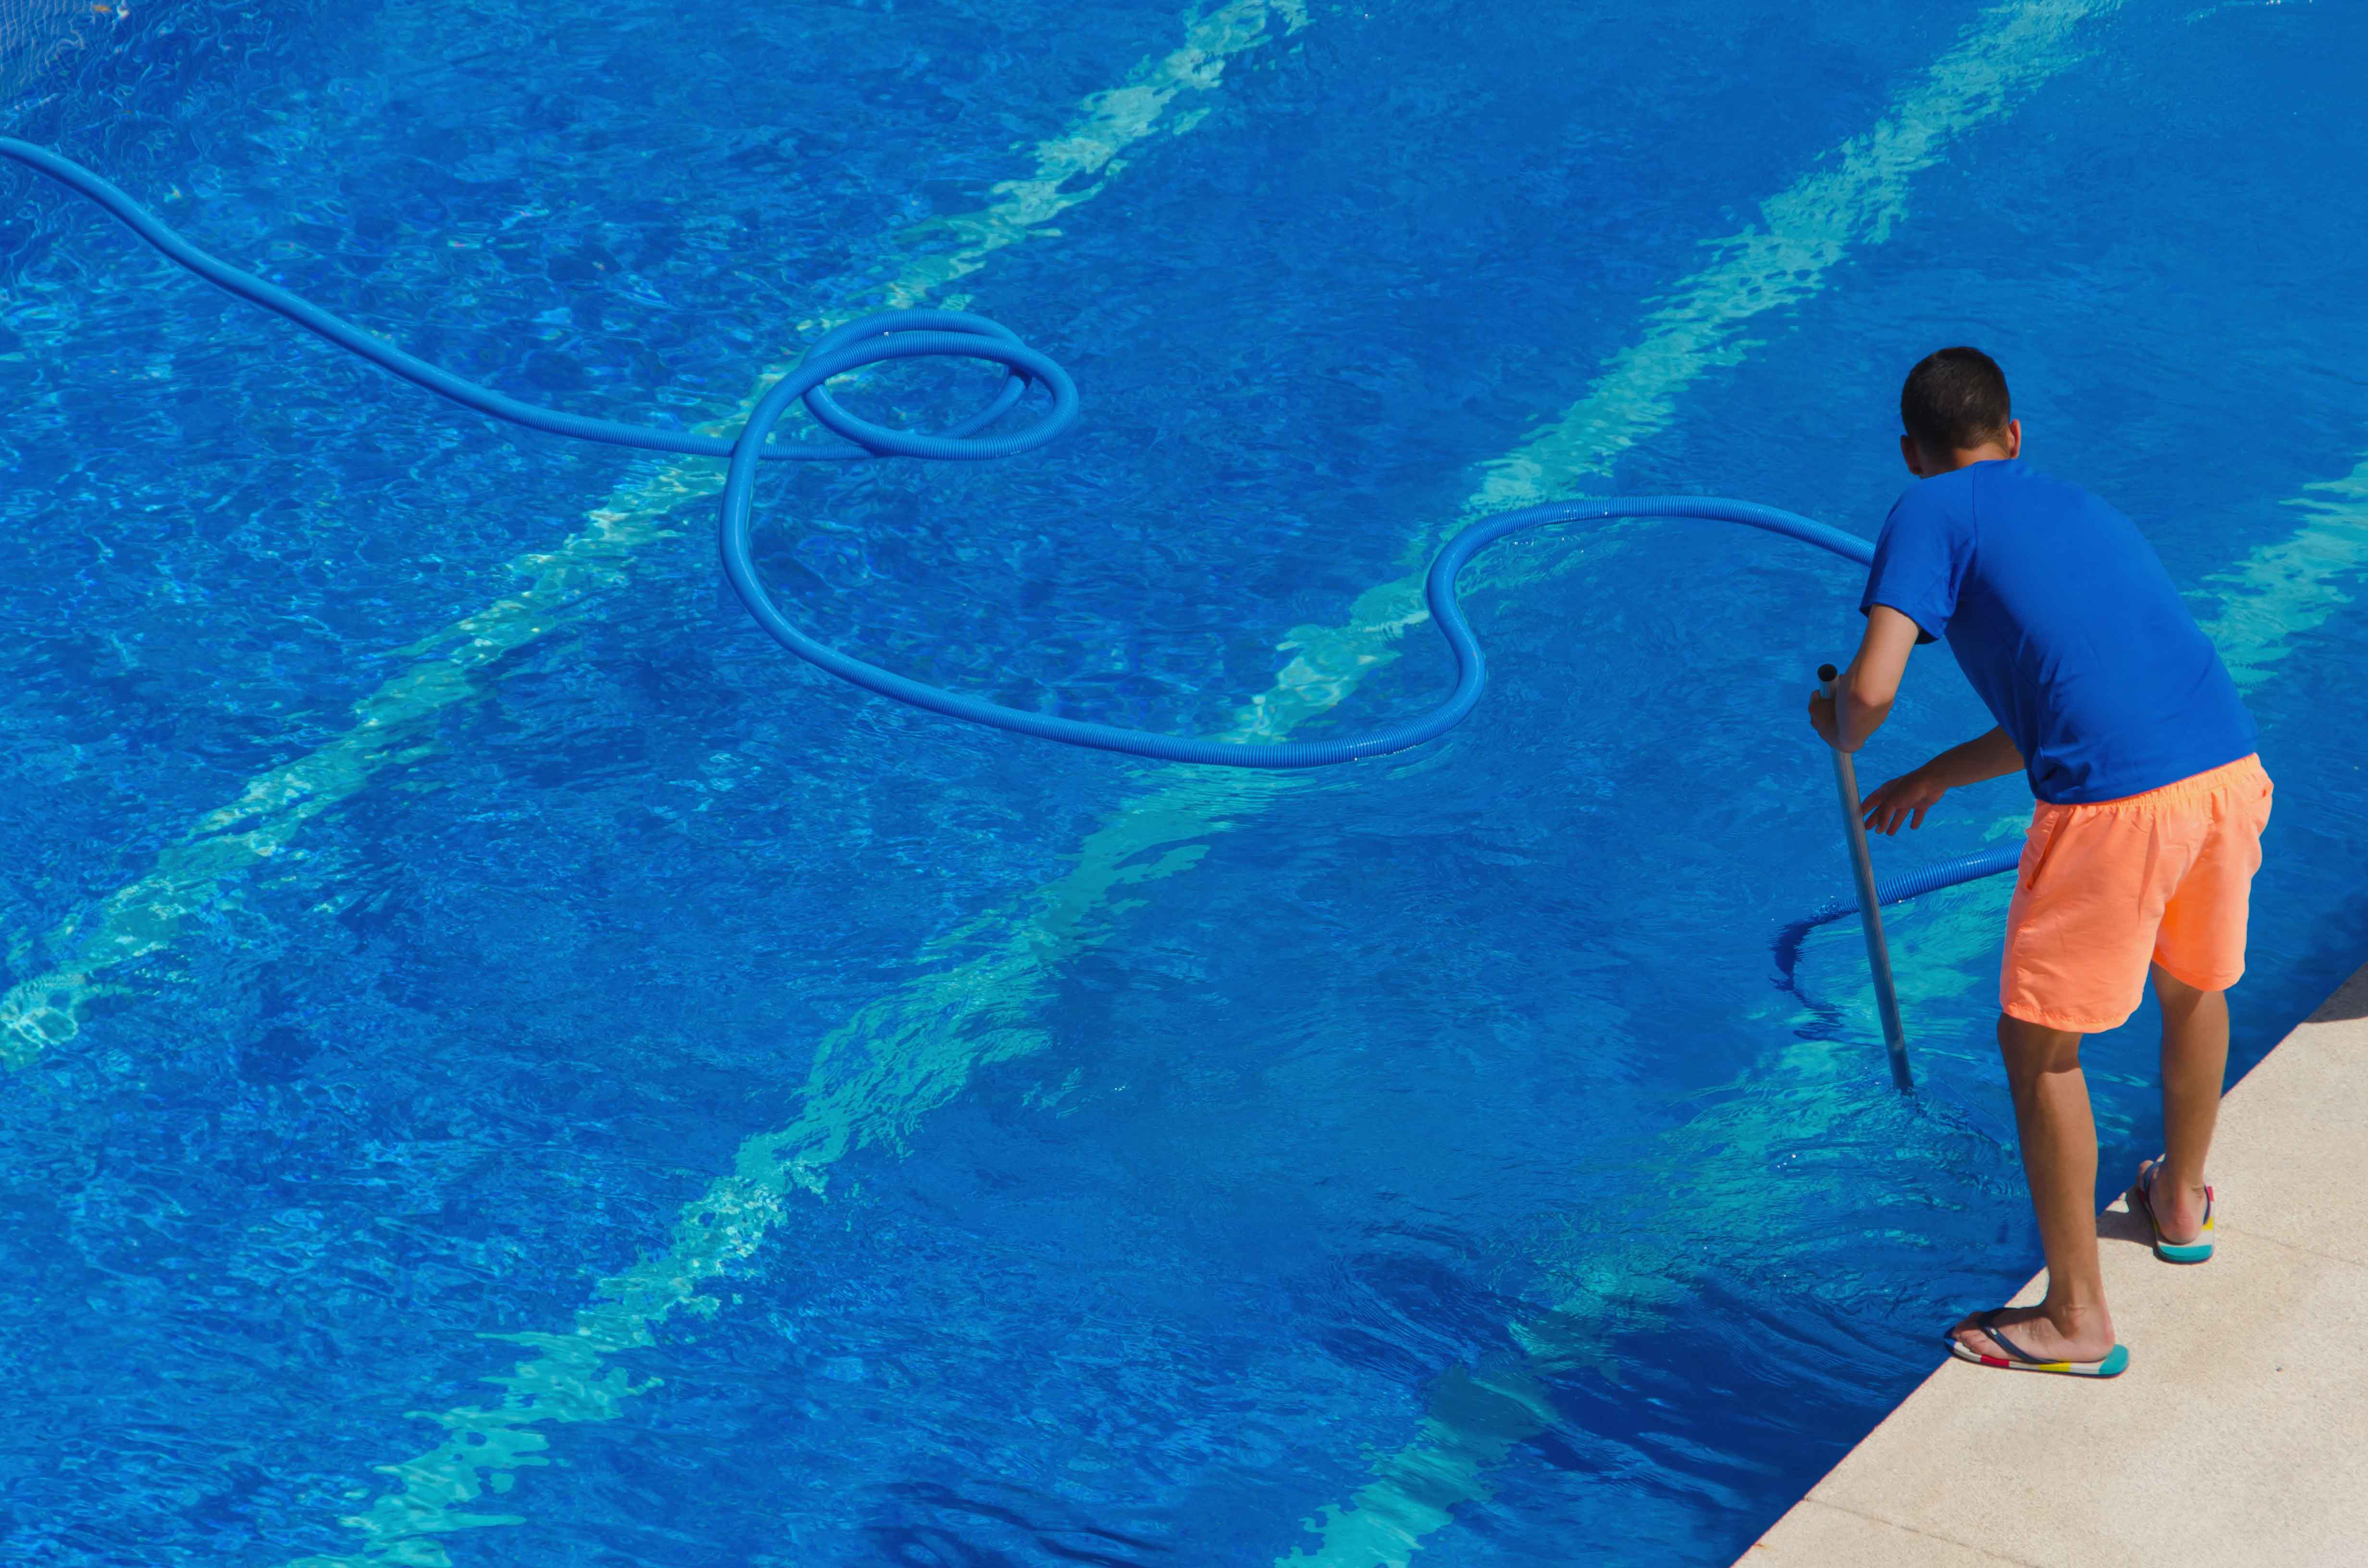 Chico limpiando piscina